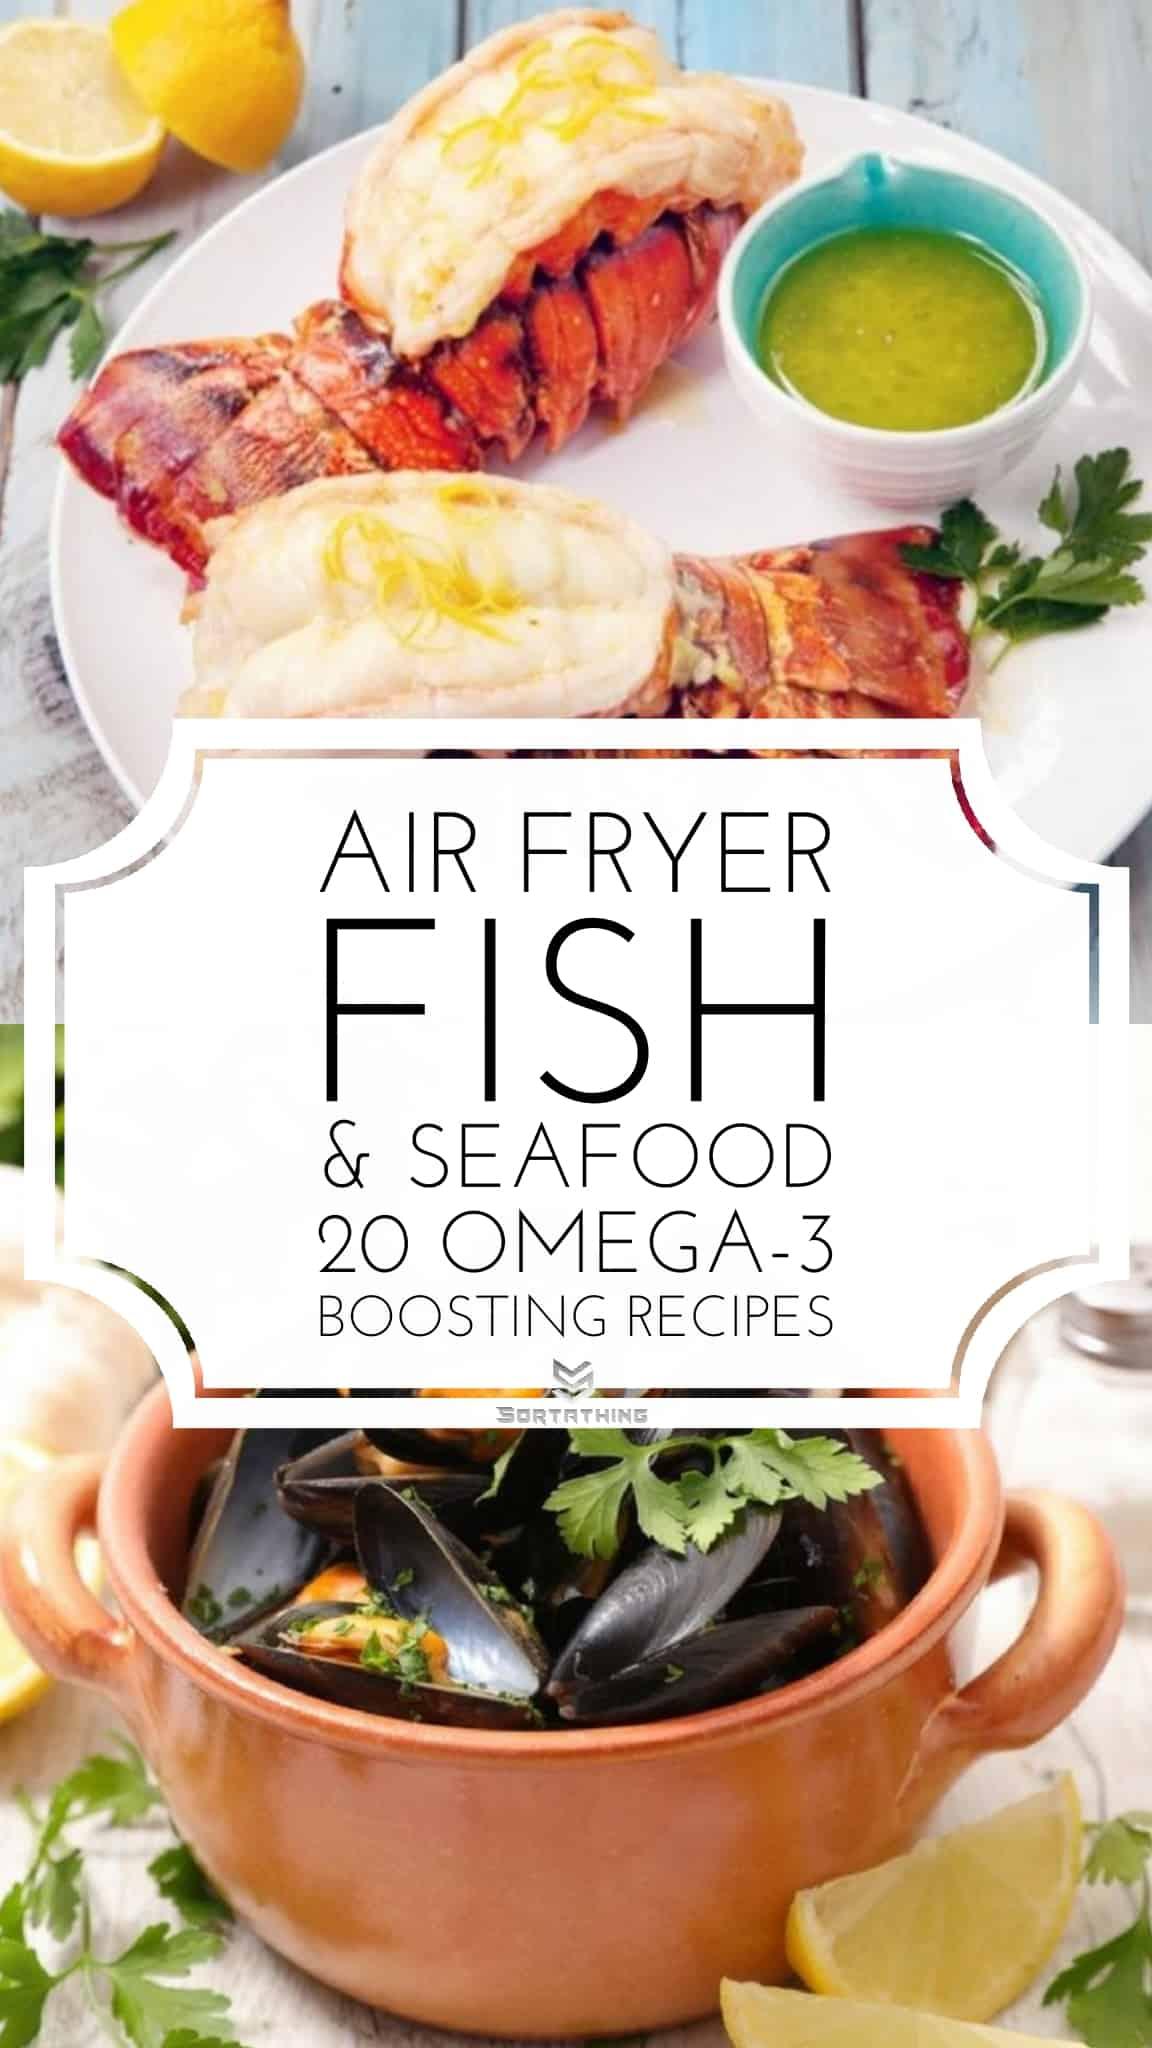 Air Fryer Lobster Tails & Air Fryer Steamed Mussels